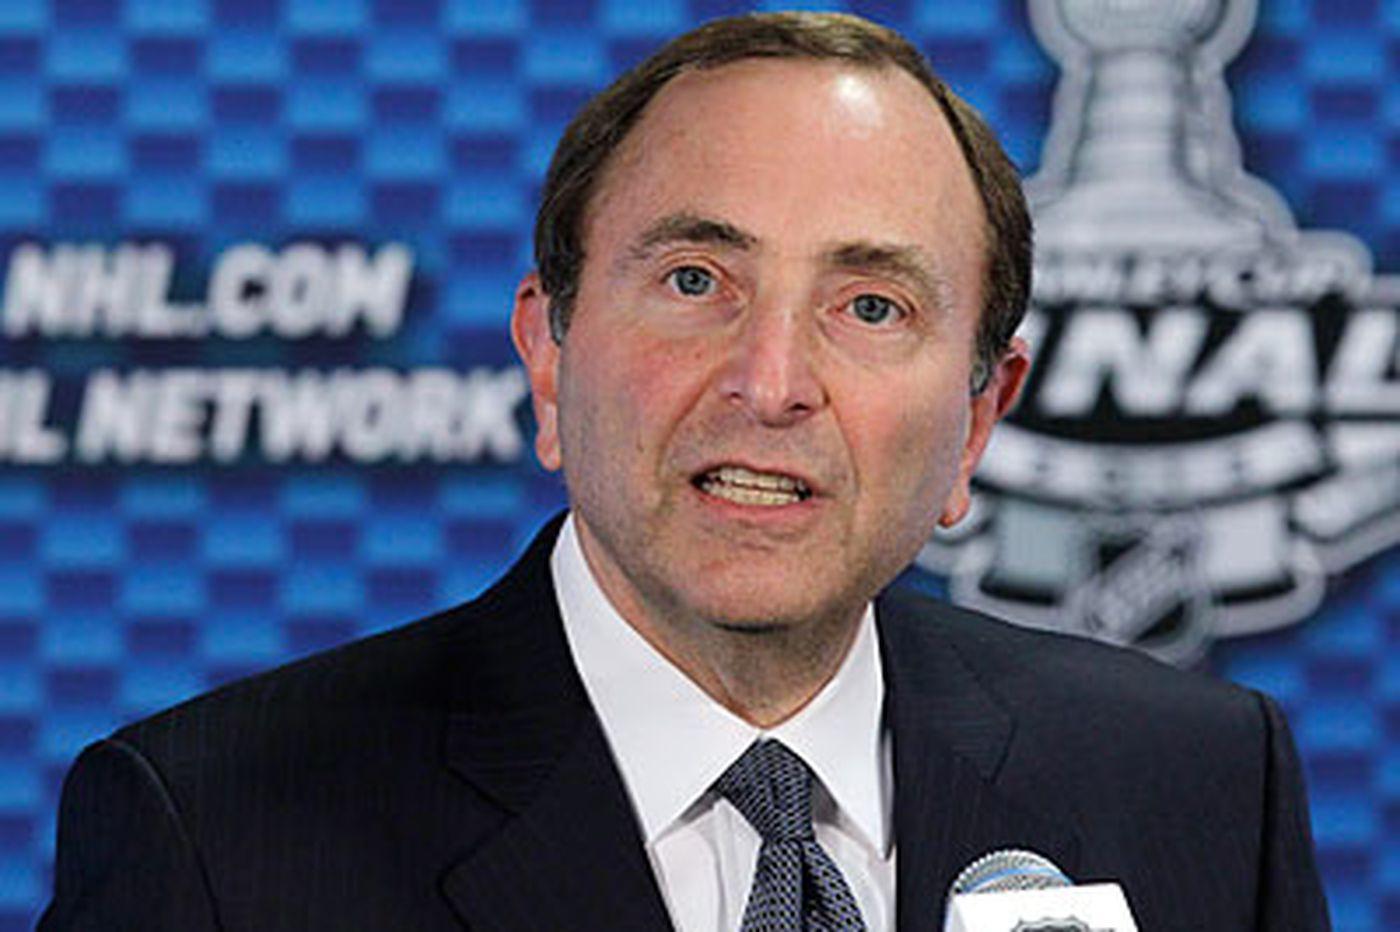 National Hockey League commissioner Gary Bettman confident about CBA talks